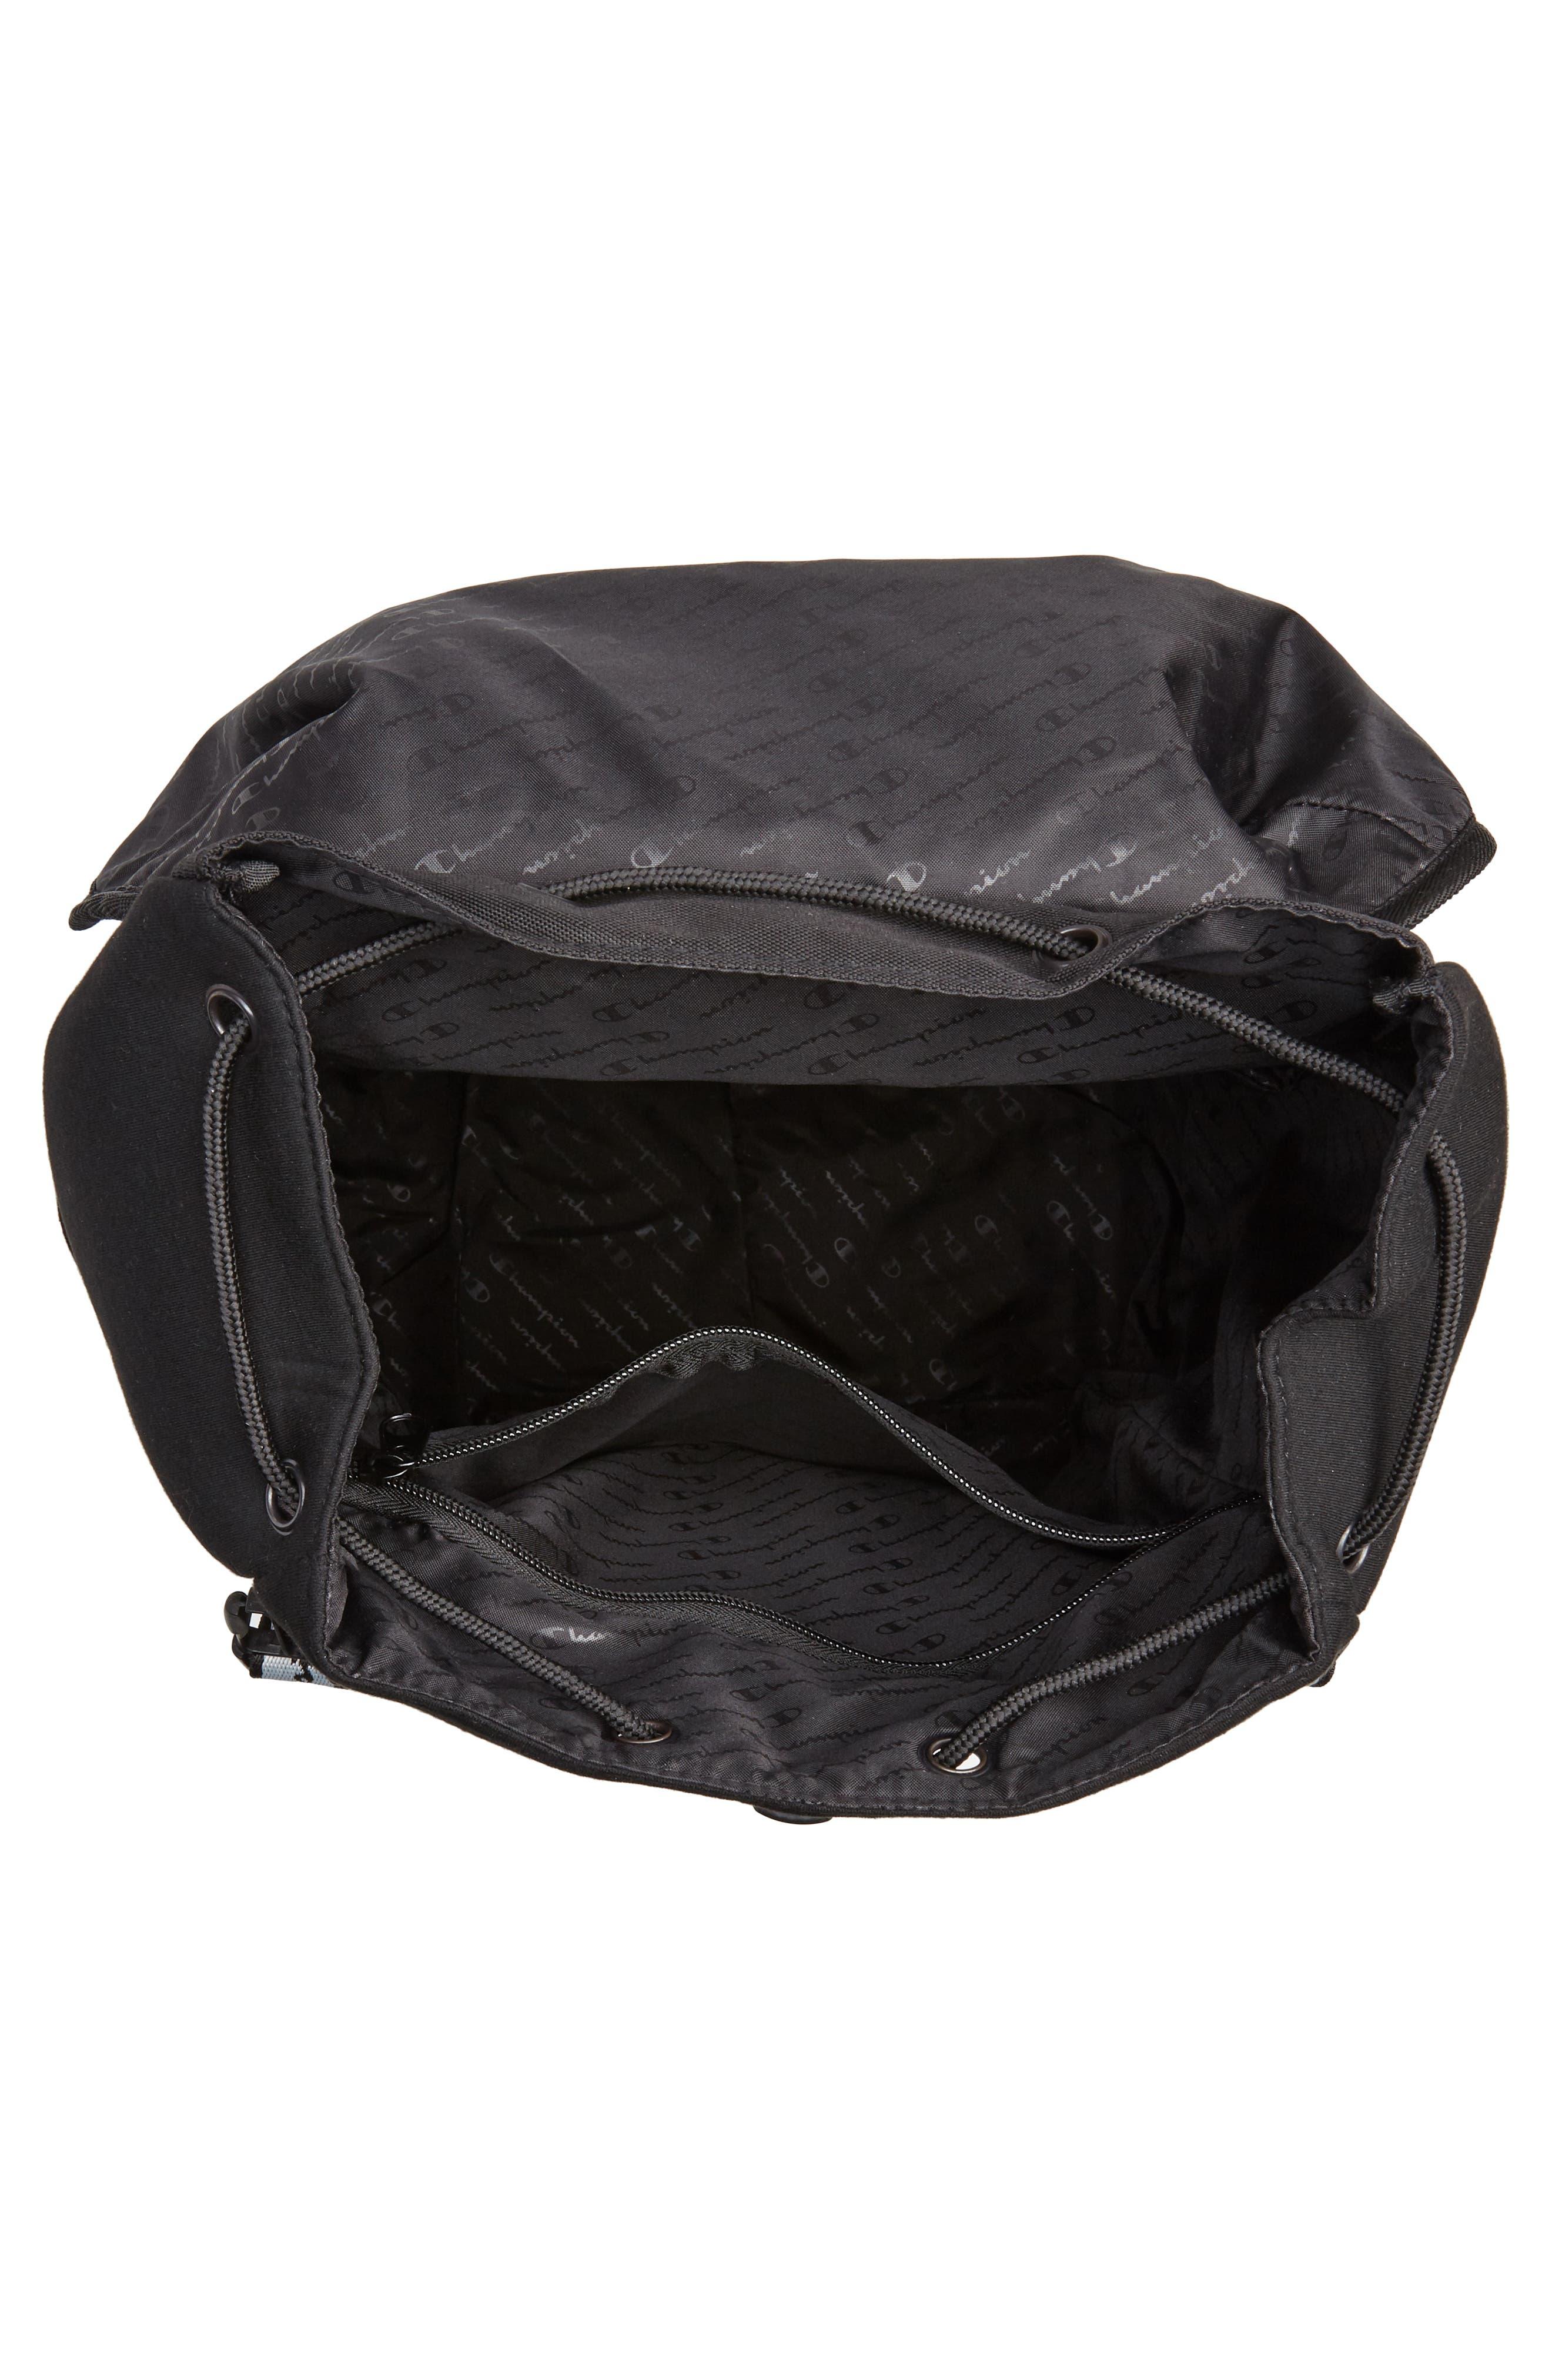 Top Load Backpack,                             Alternate thumbnail 4, color,                             BLACK